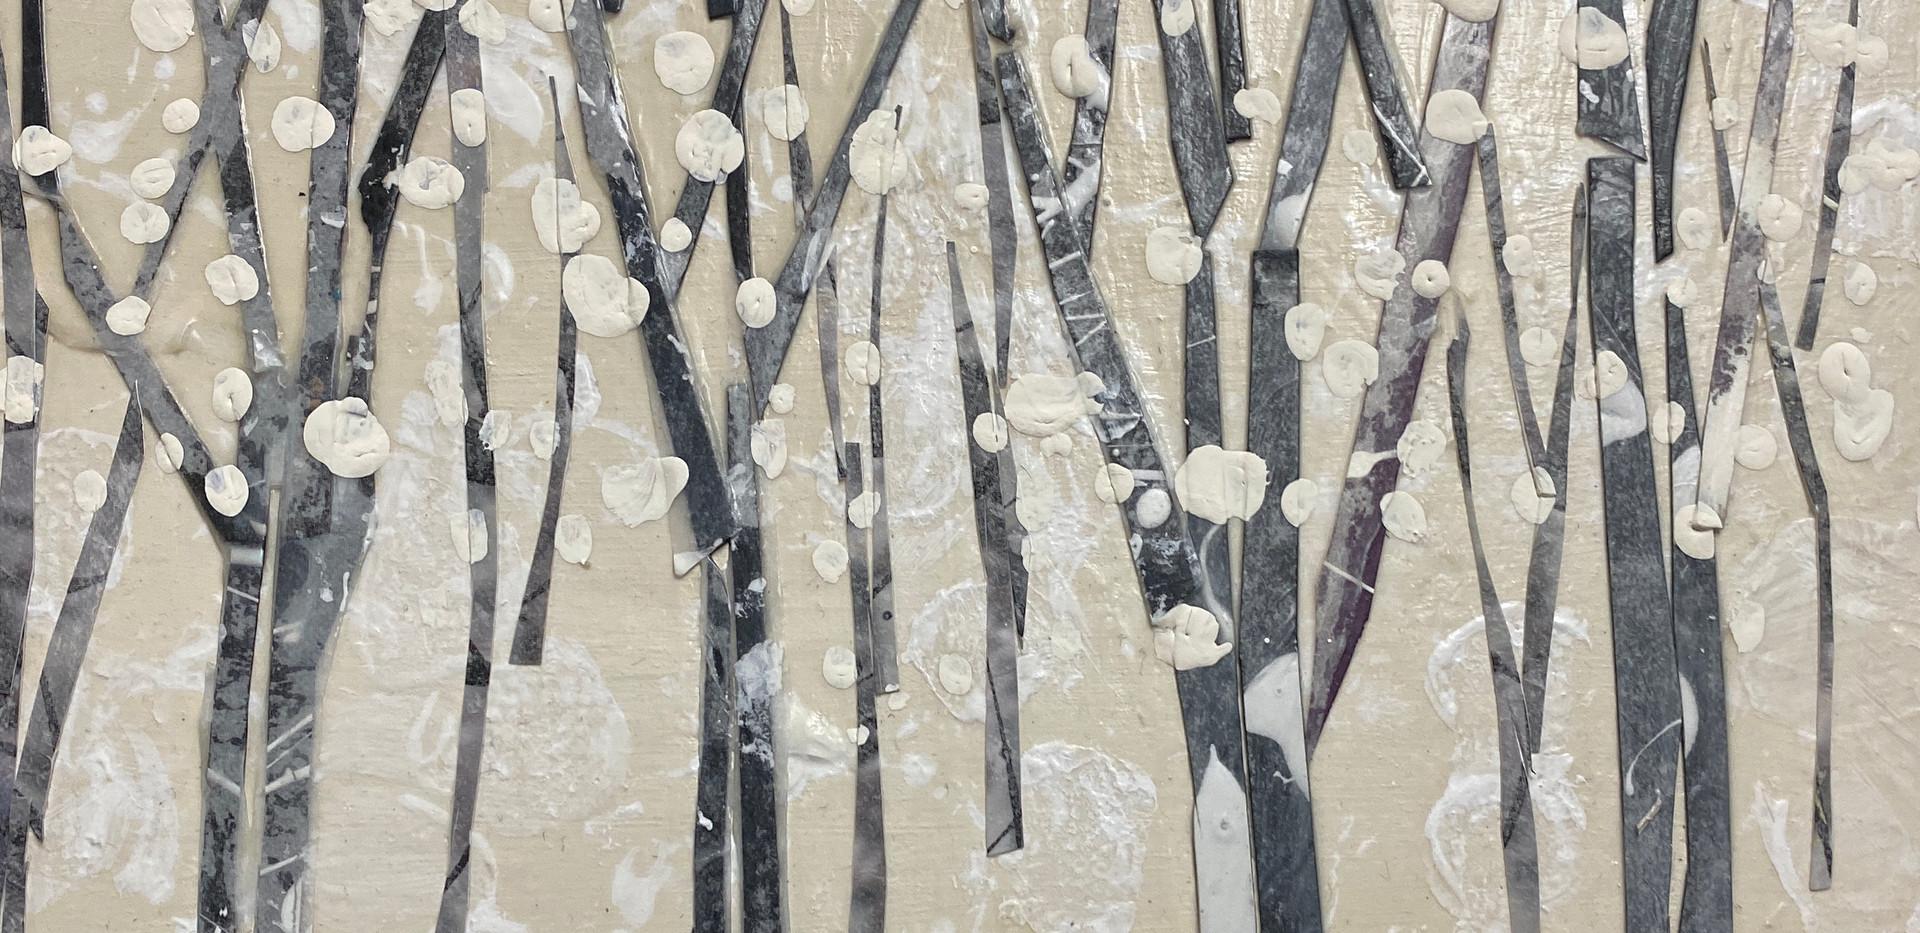 treescape 5 10 x 10.JPG